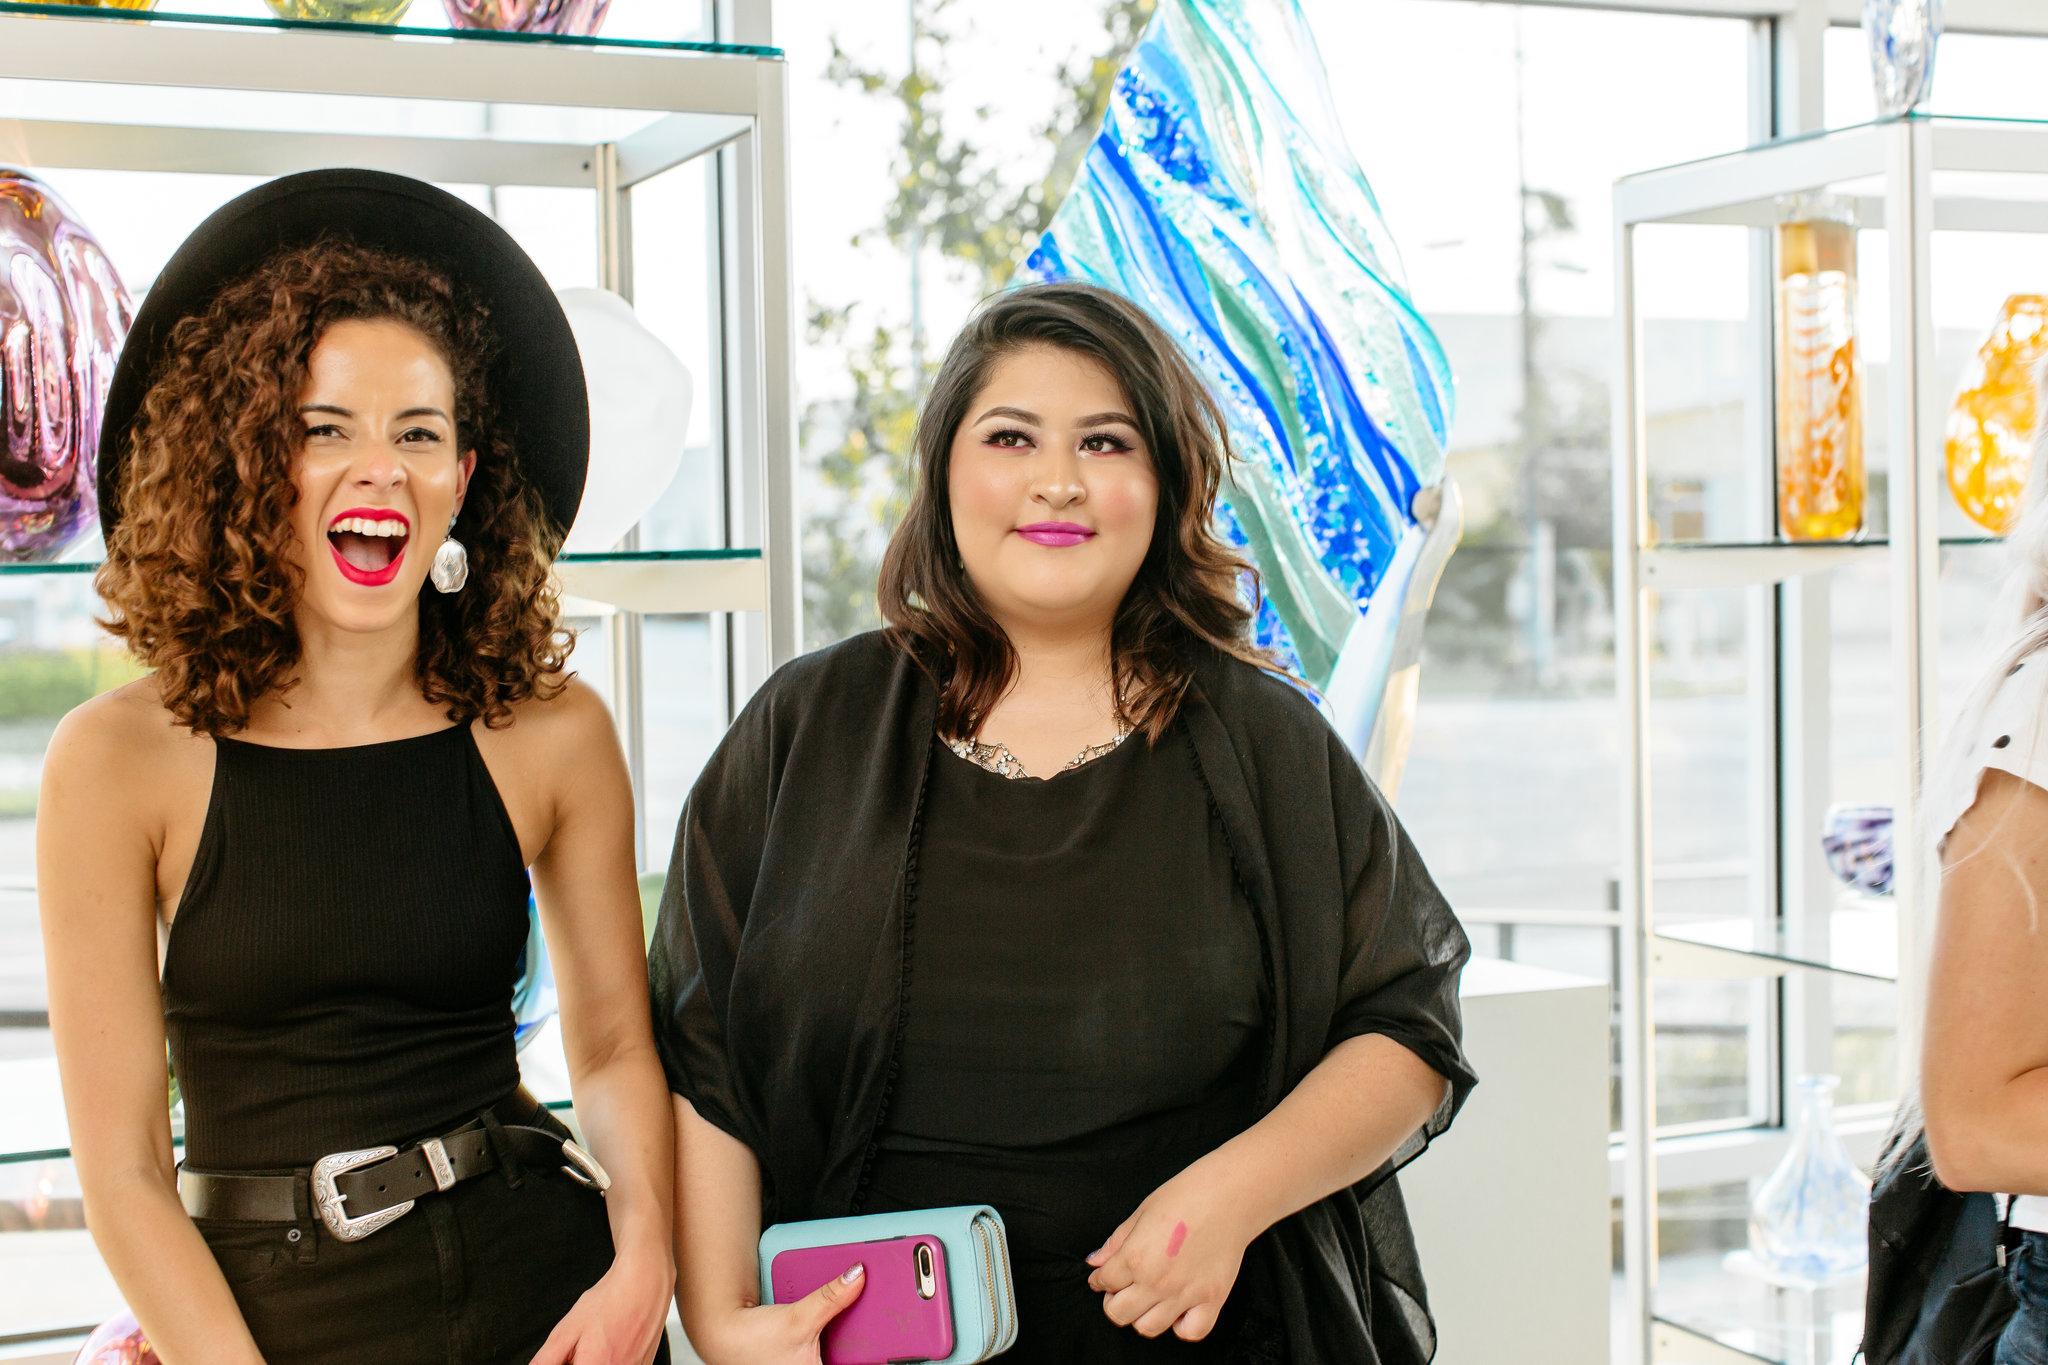 Alexa-Vossler-Photo_Dallas-Event-Photographer_Brite-Bar-Beauty-2018-Lipstick-Launch-Party-164.jpg